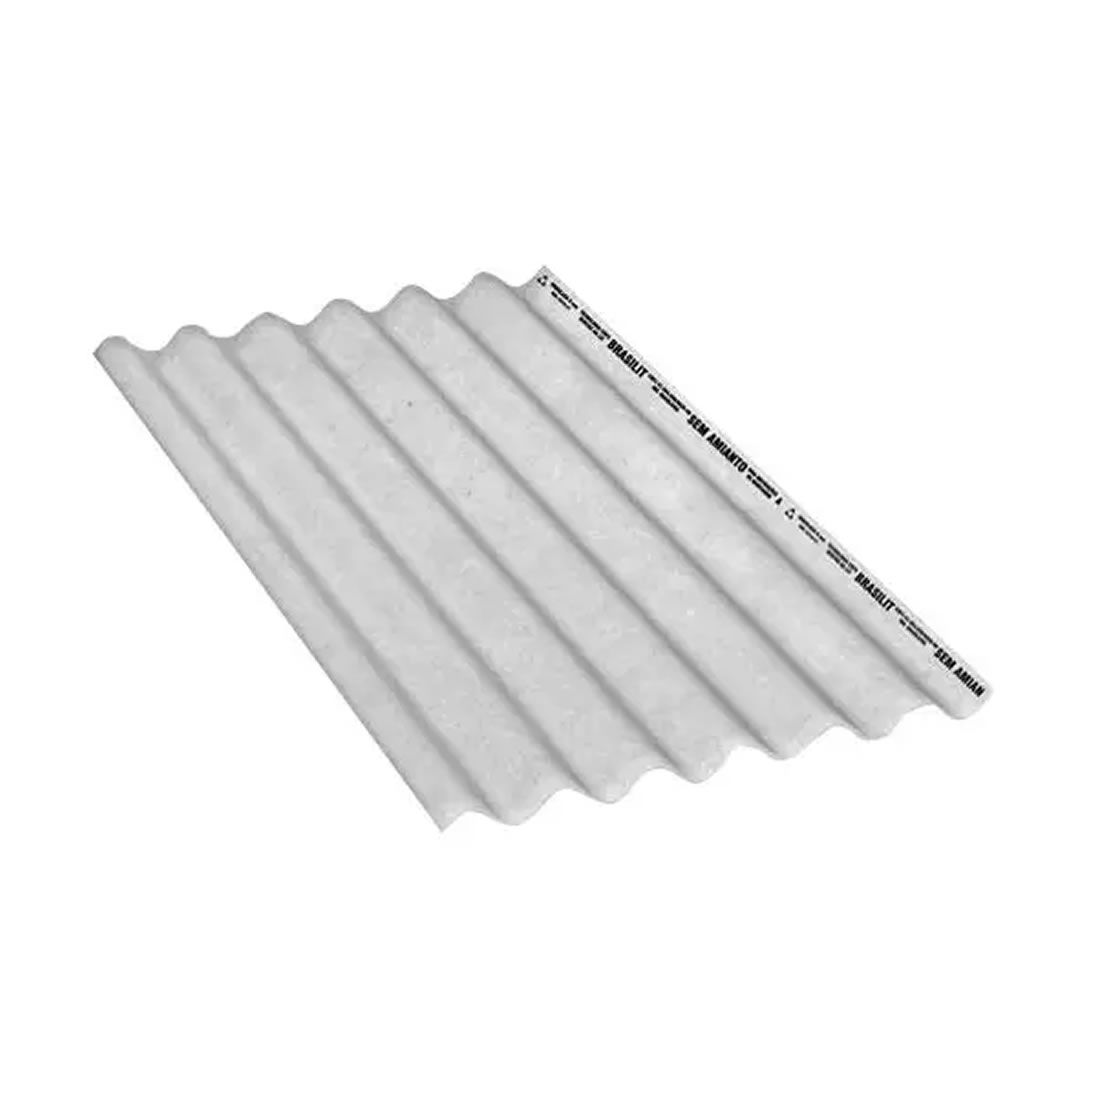 Telha de Fibrocimento Ondulada CRFS Cinza 2,13x1,10mx5mm Brasilit